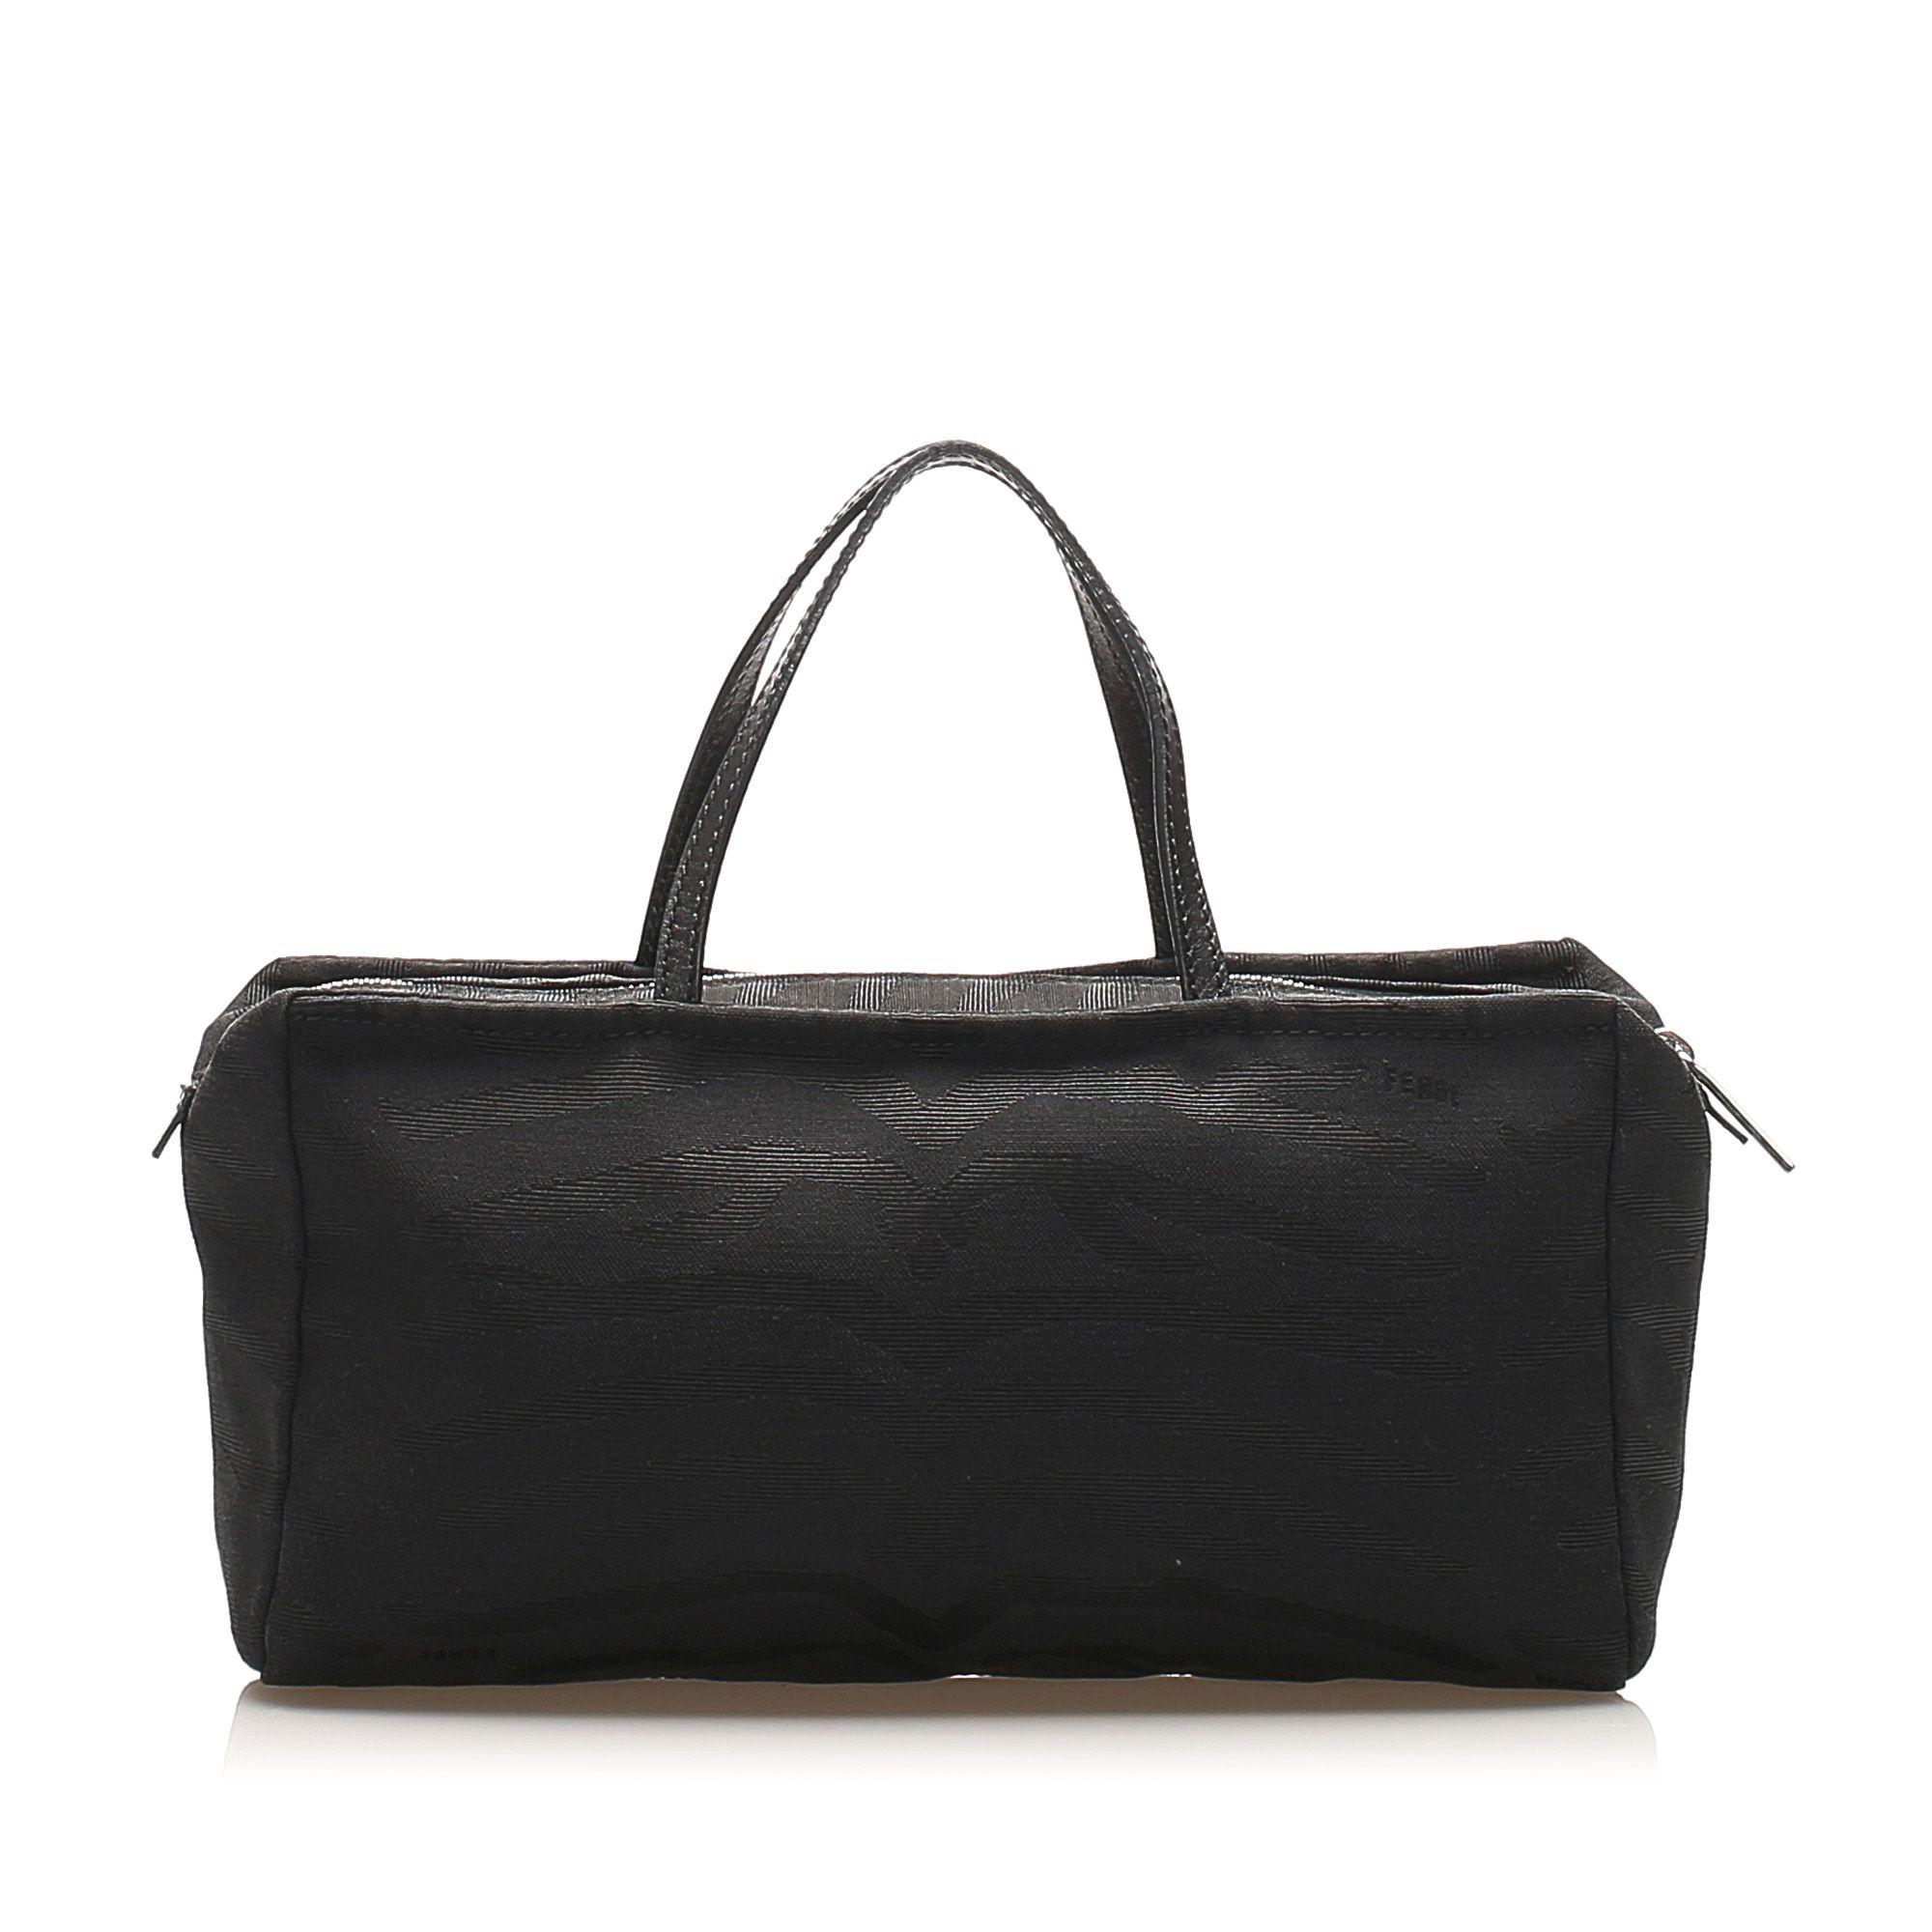 Vintage Fendi Canvas Handbag Black